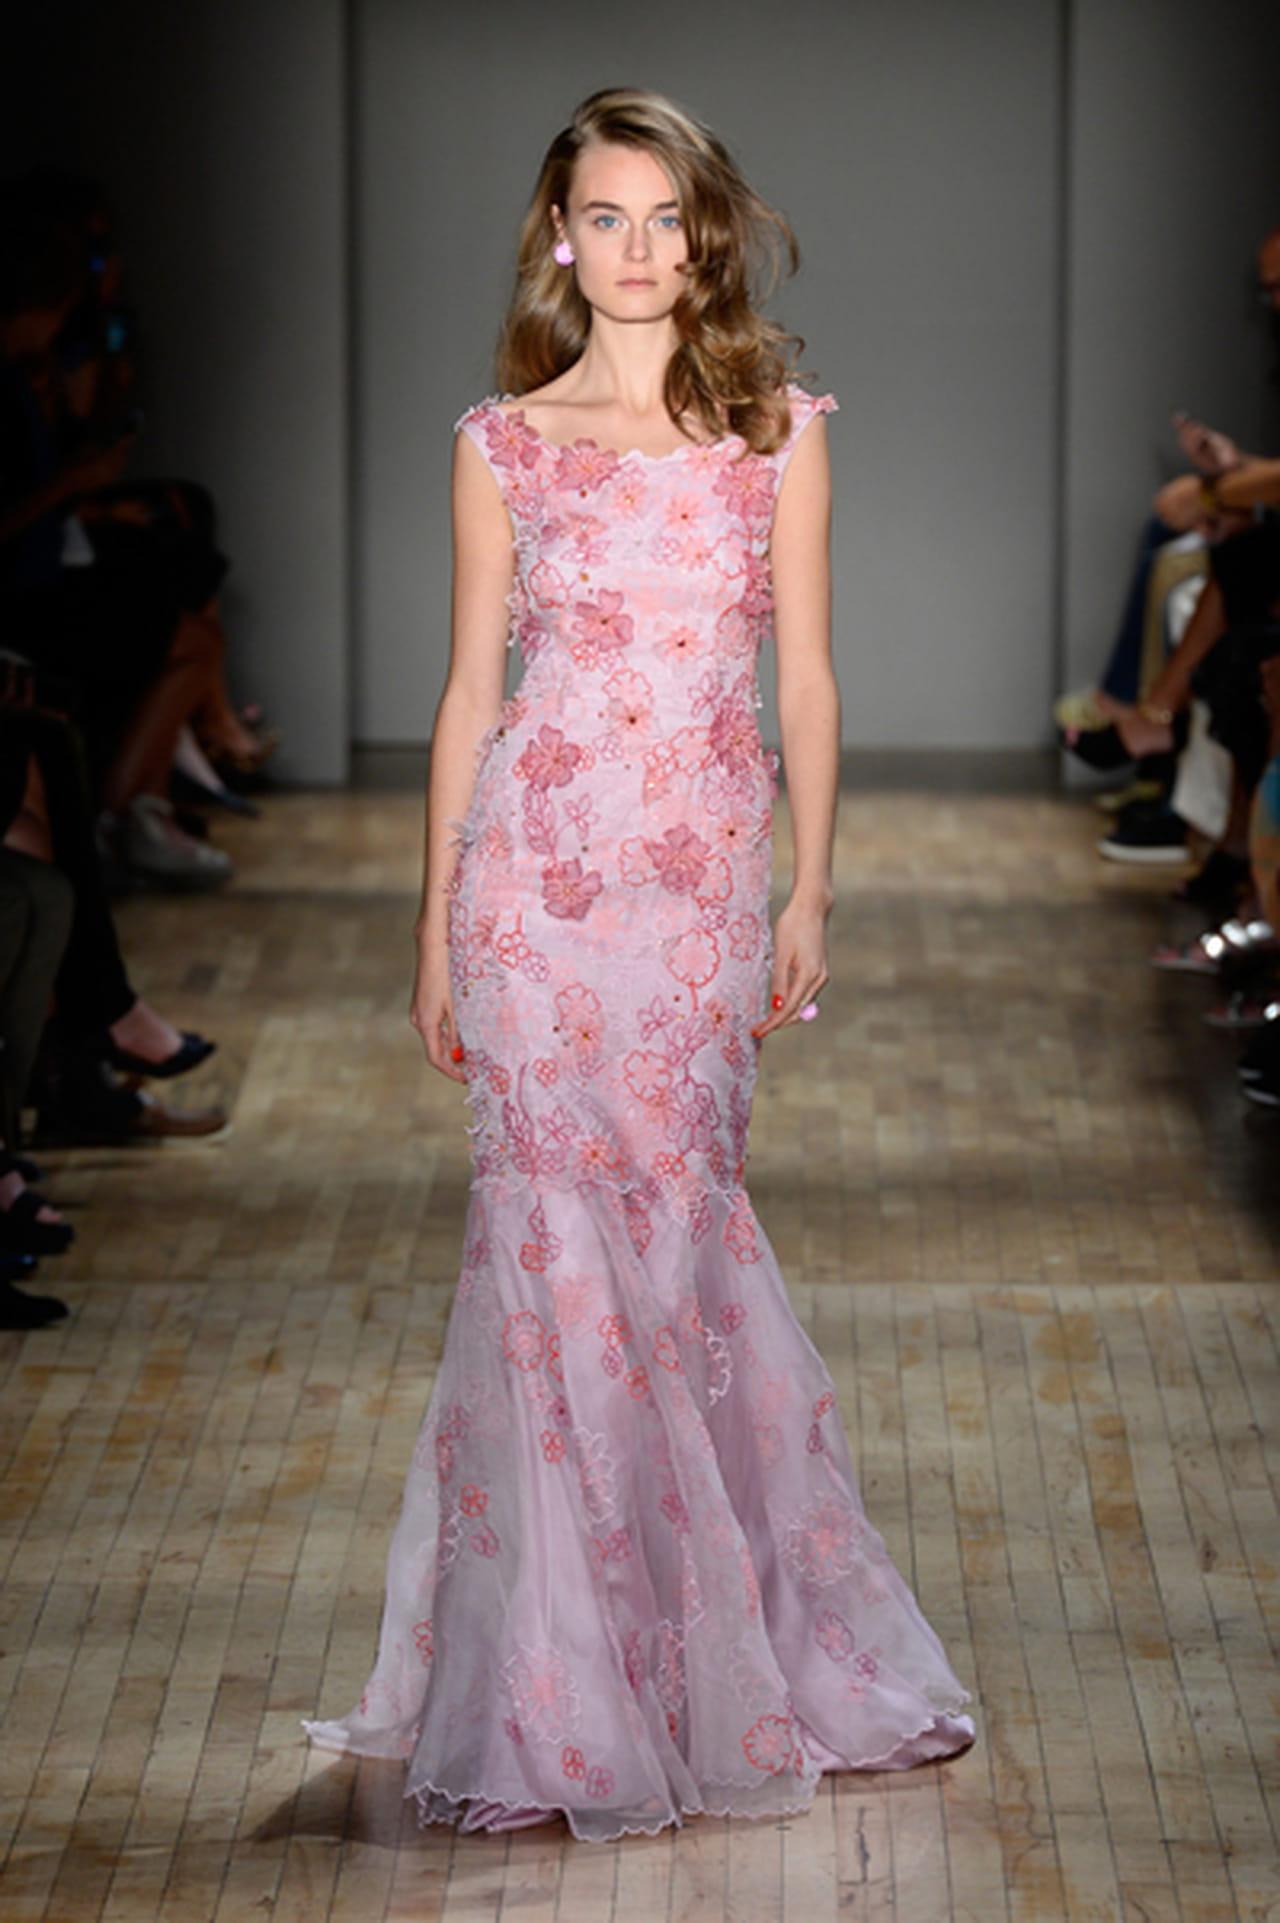 c399be449 اجمل فساتين وردية 2015 .. اللون المفضل لكل إمرأة رقيقة